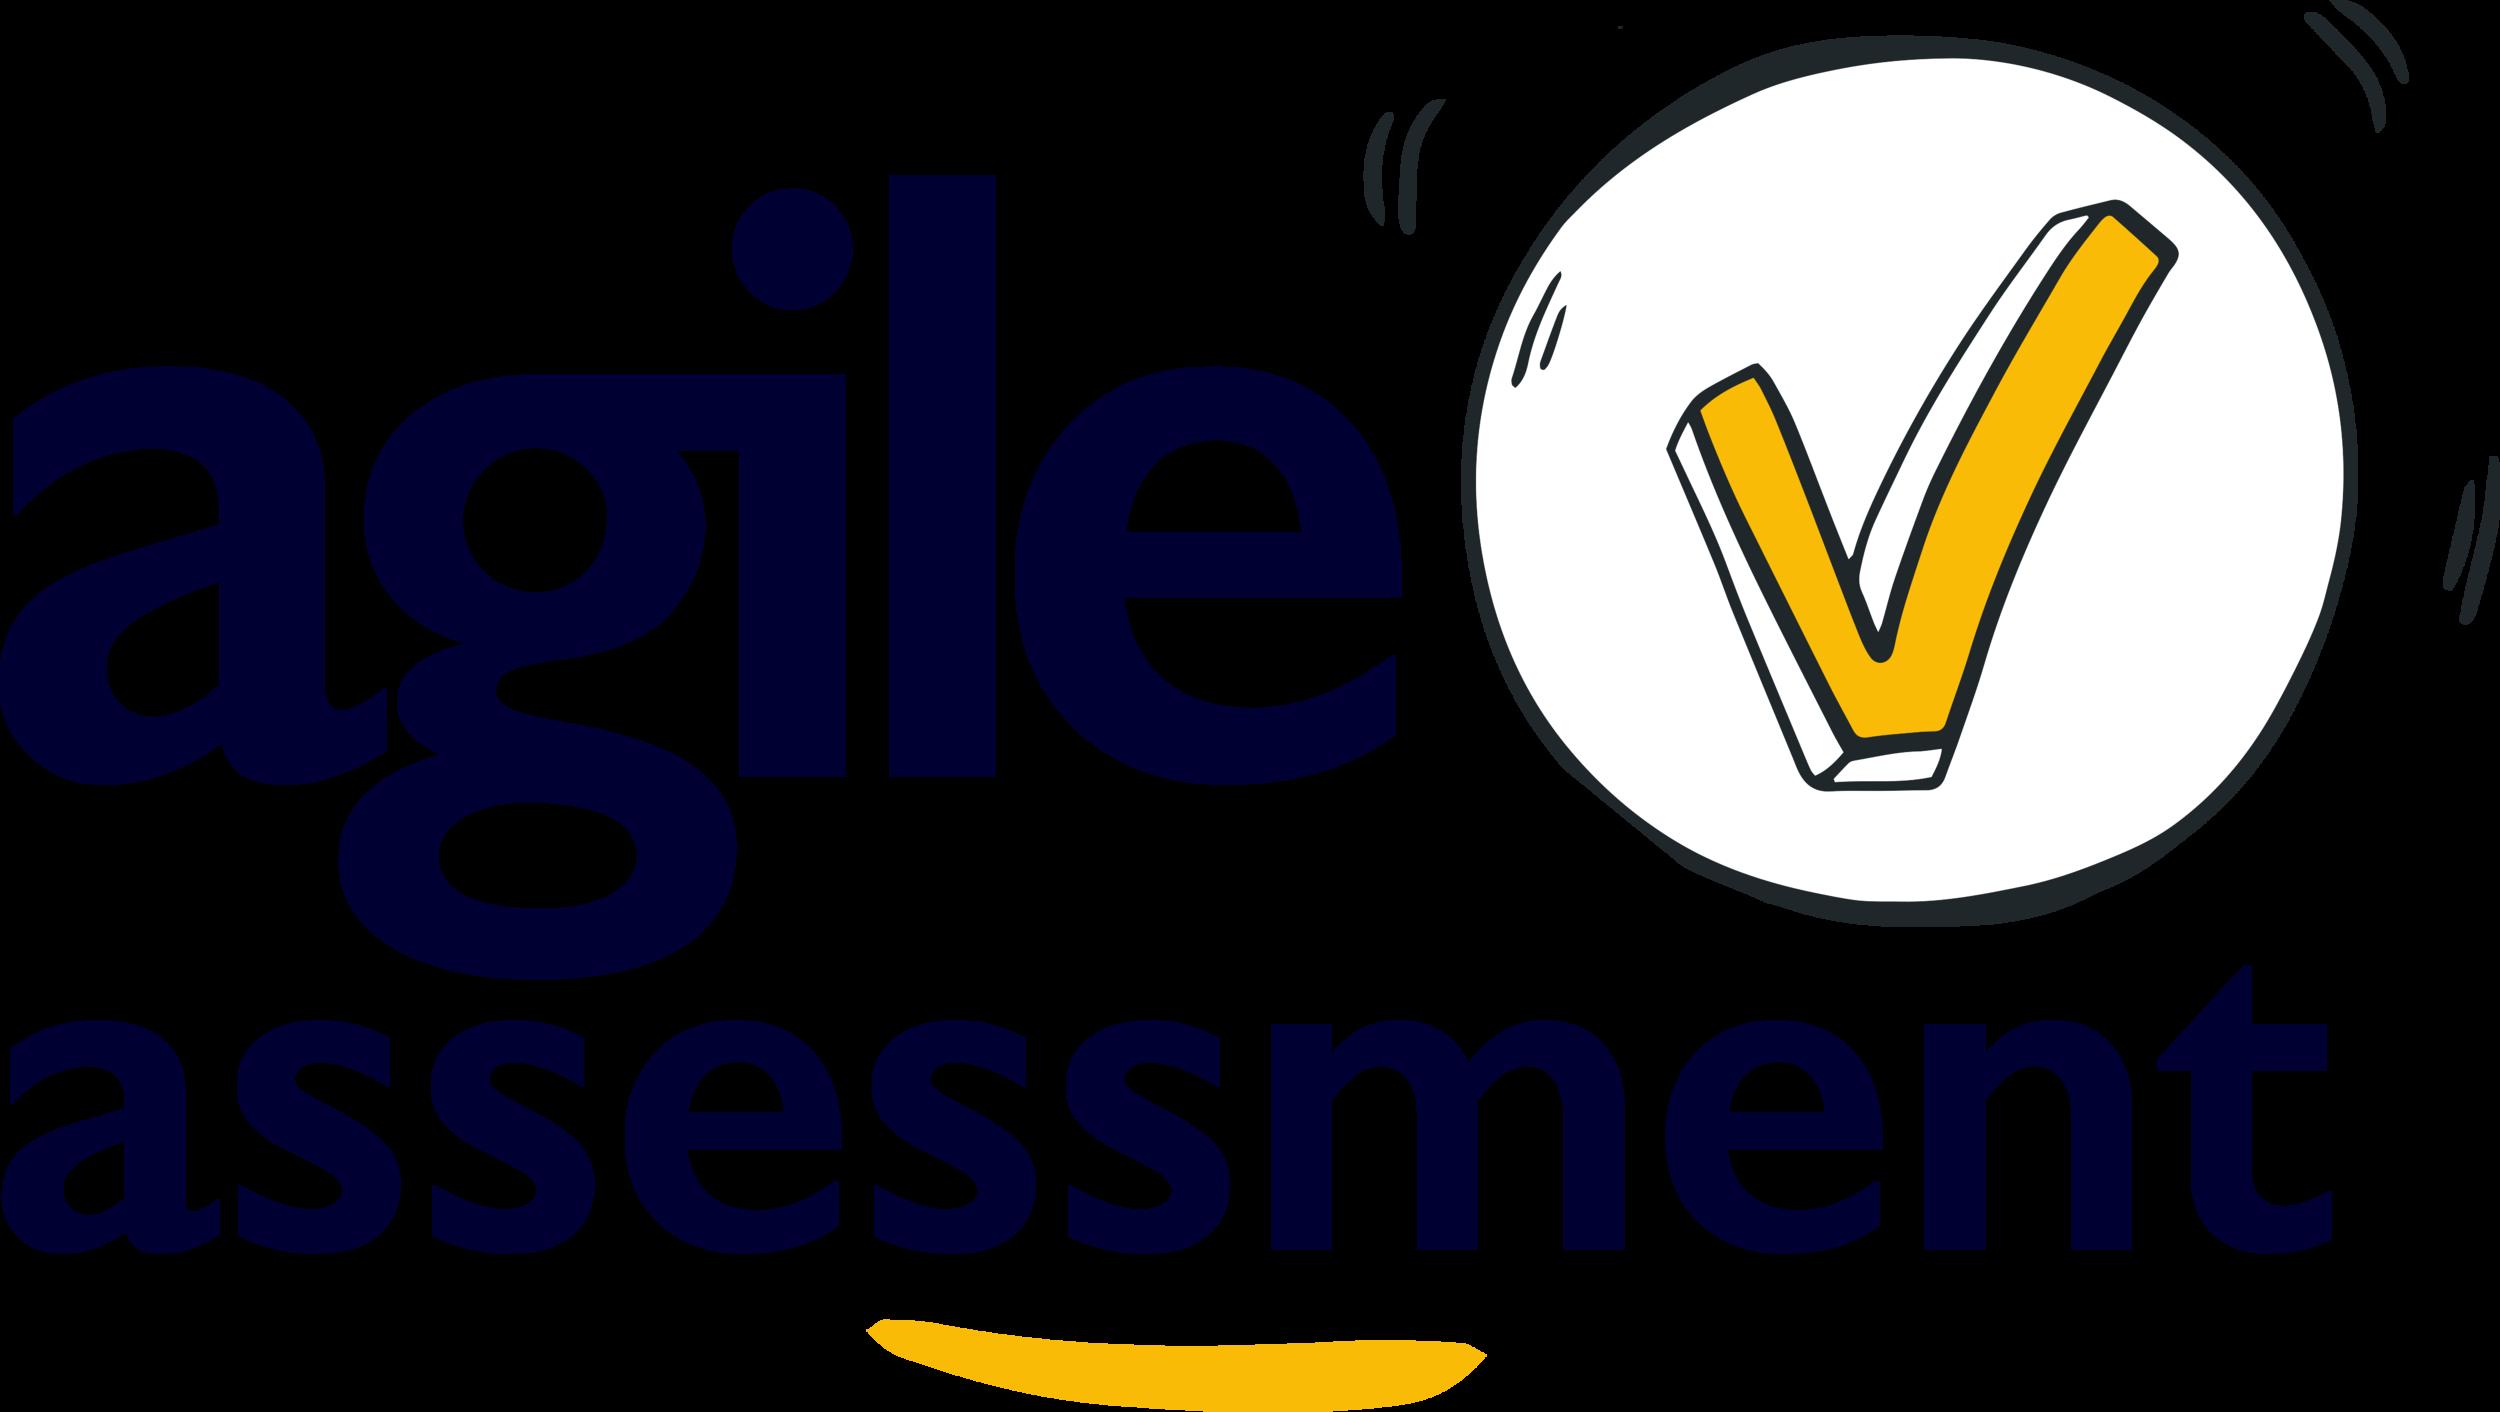 agile_assessement_logo_var2_transp.png